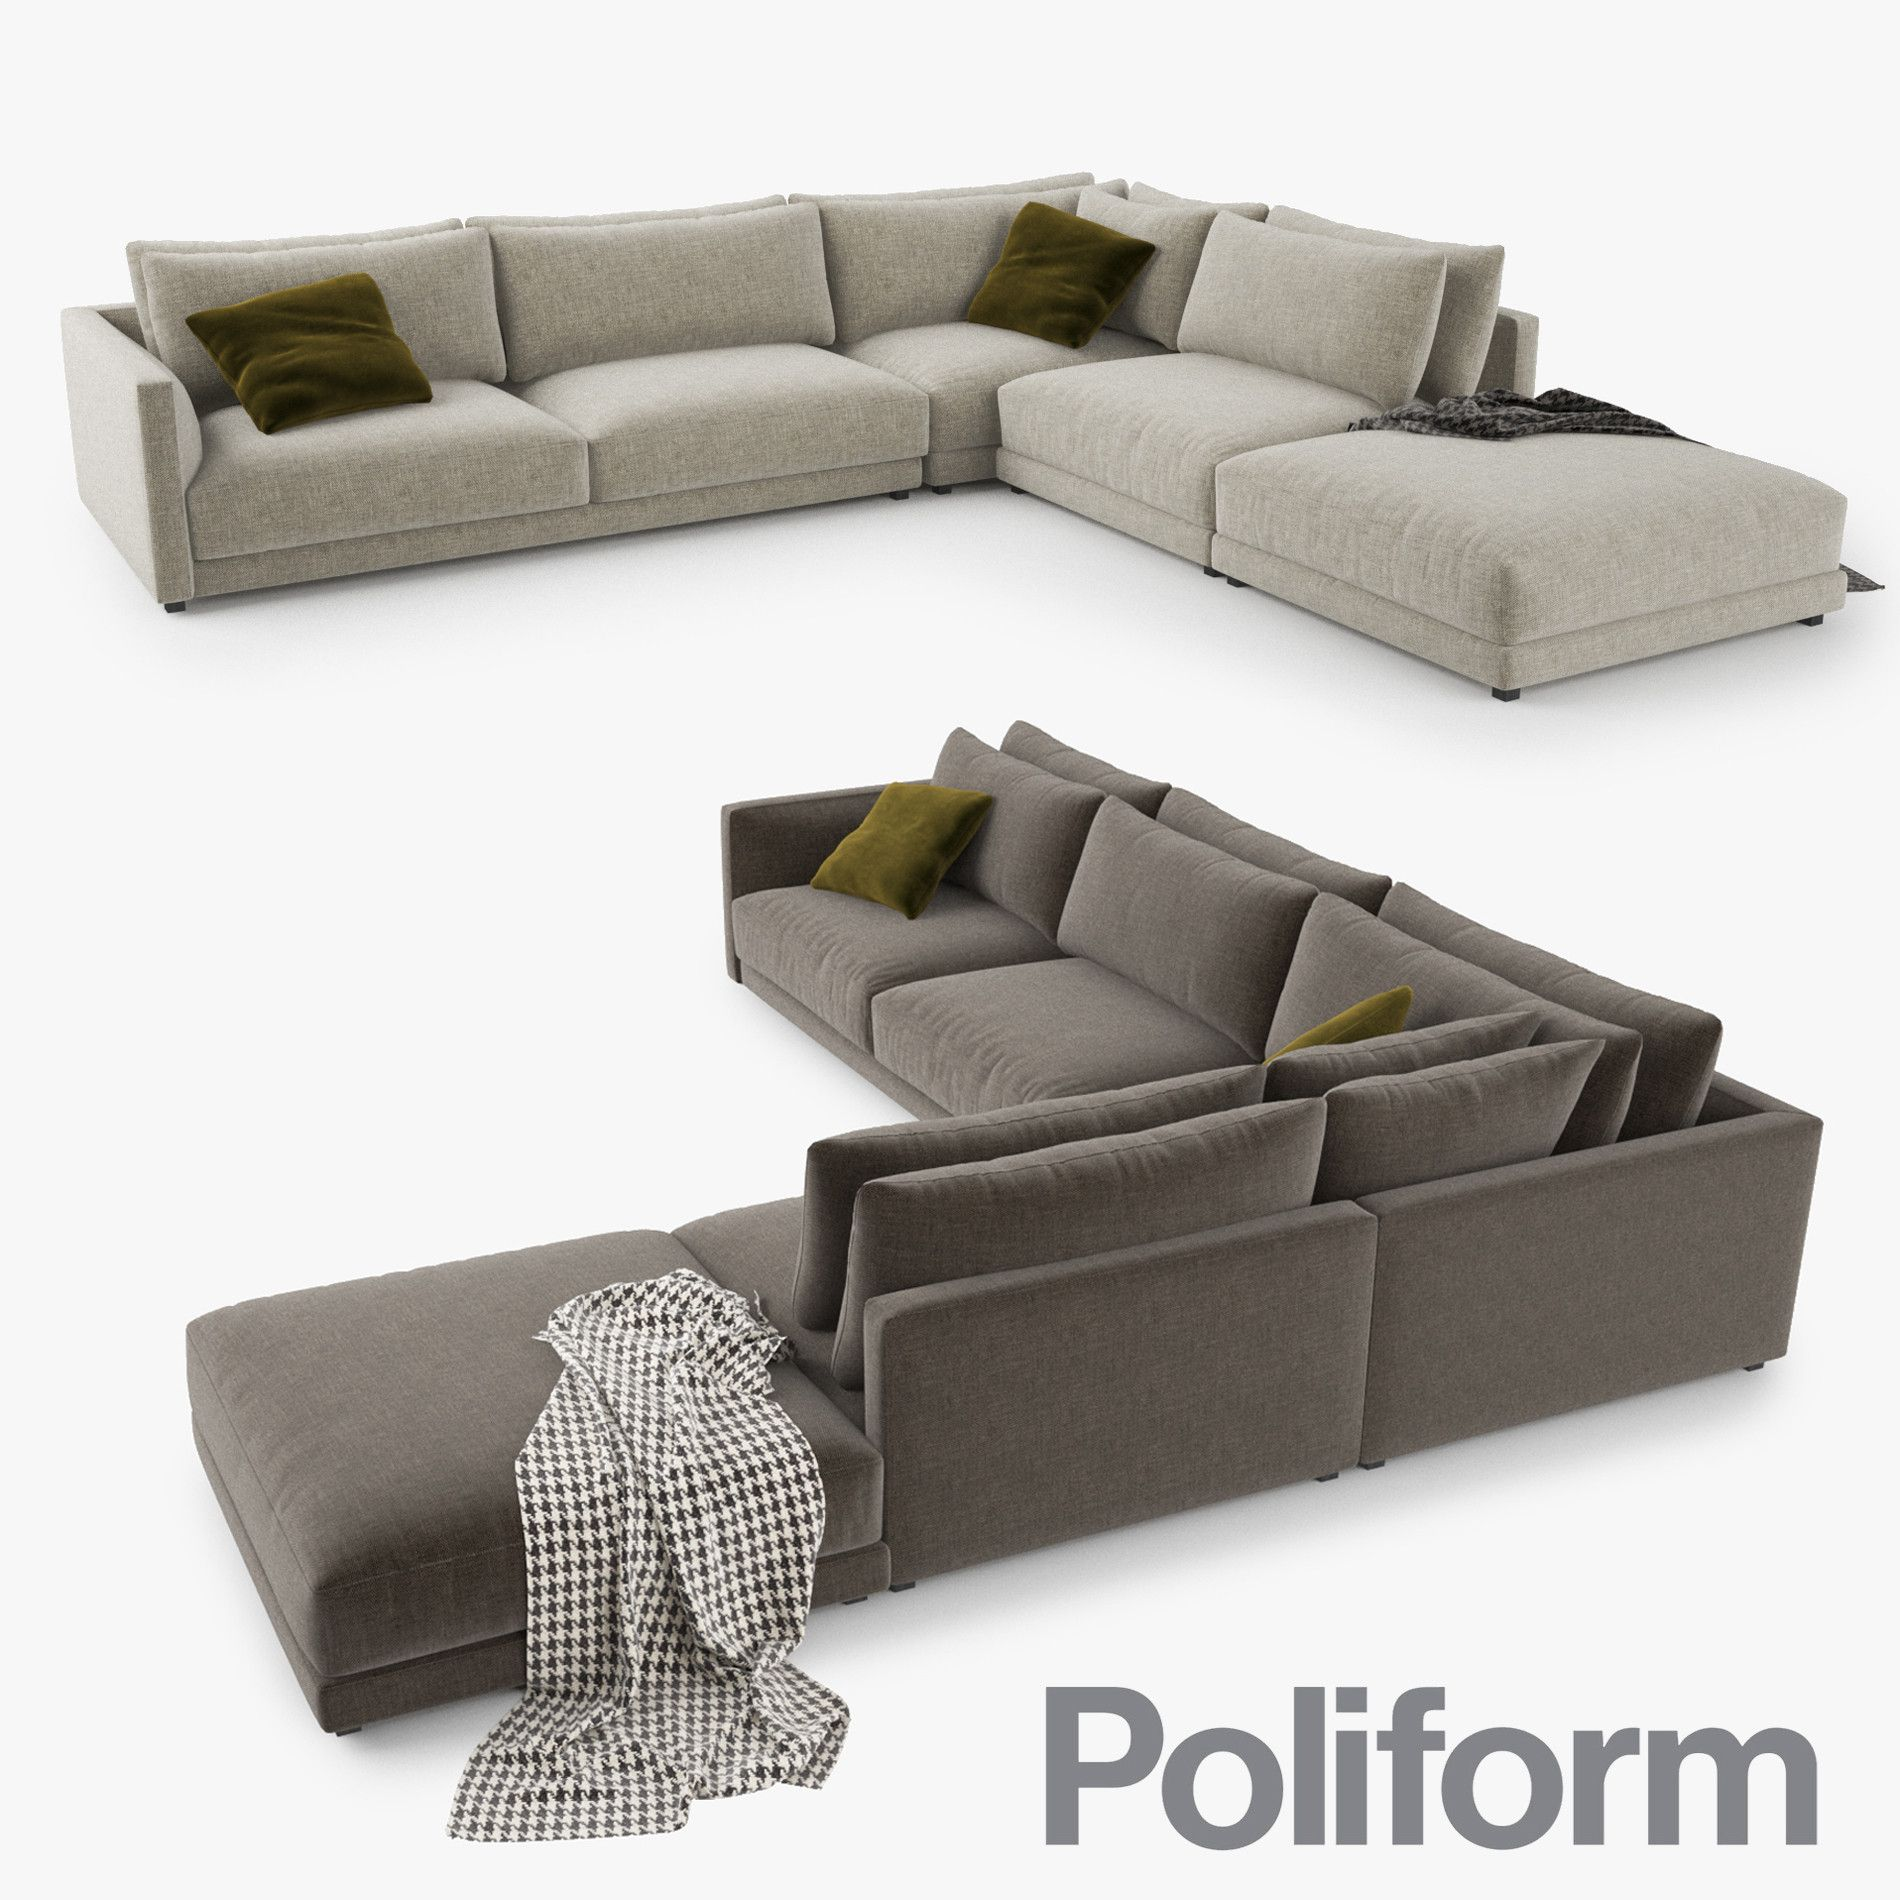 Corner Sofa Second Hand Bristol: 3d 3ds Poliform Bristol Sofa